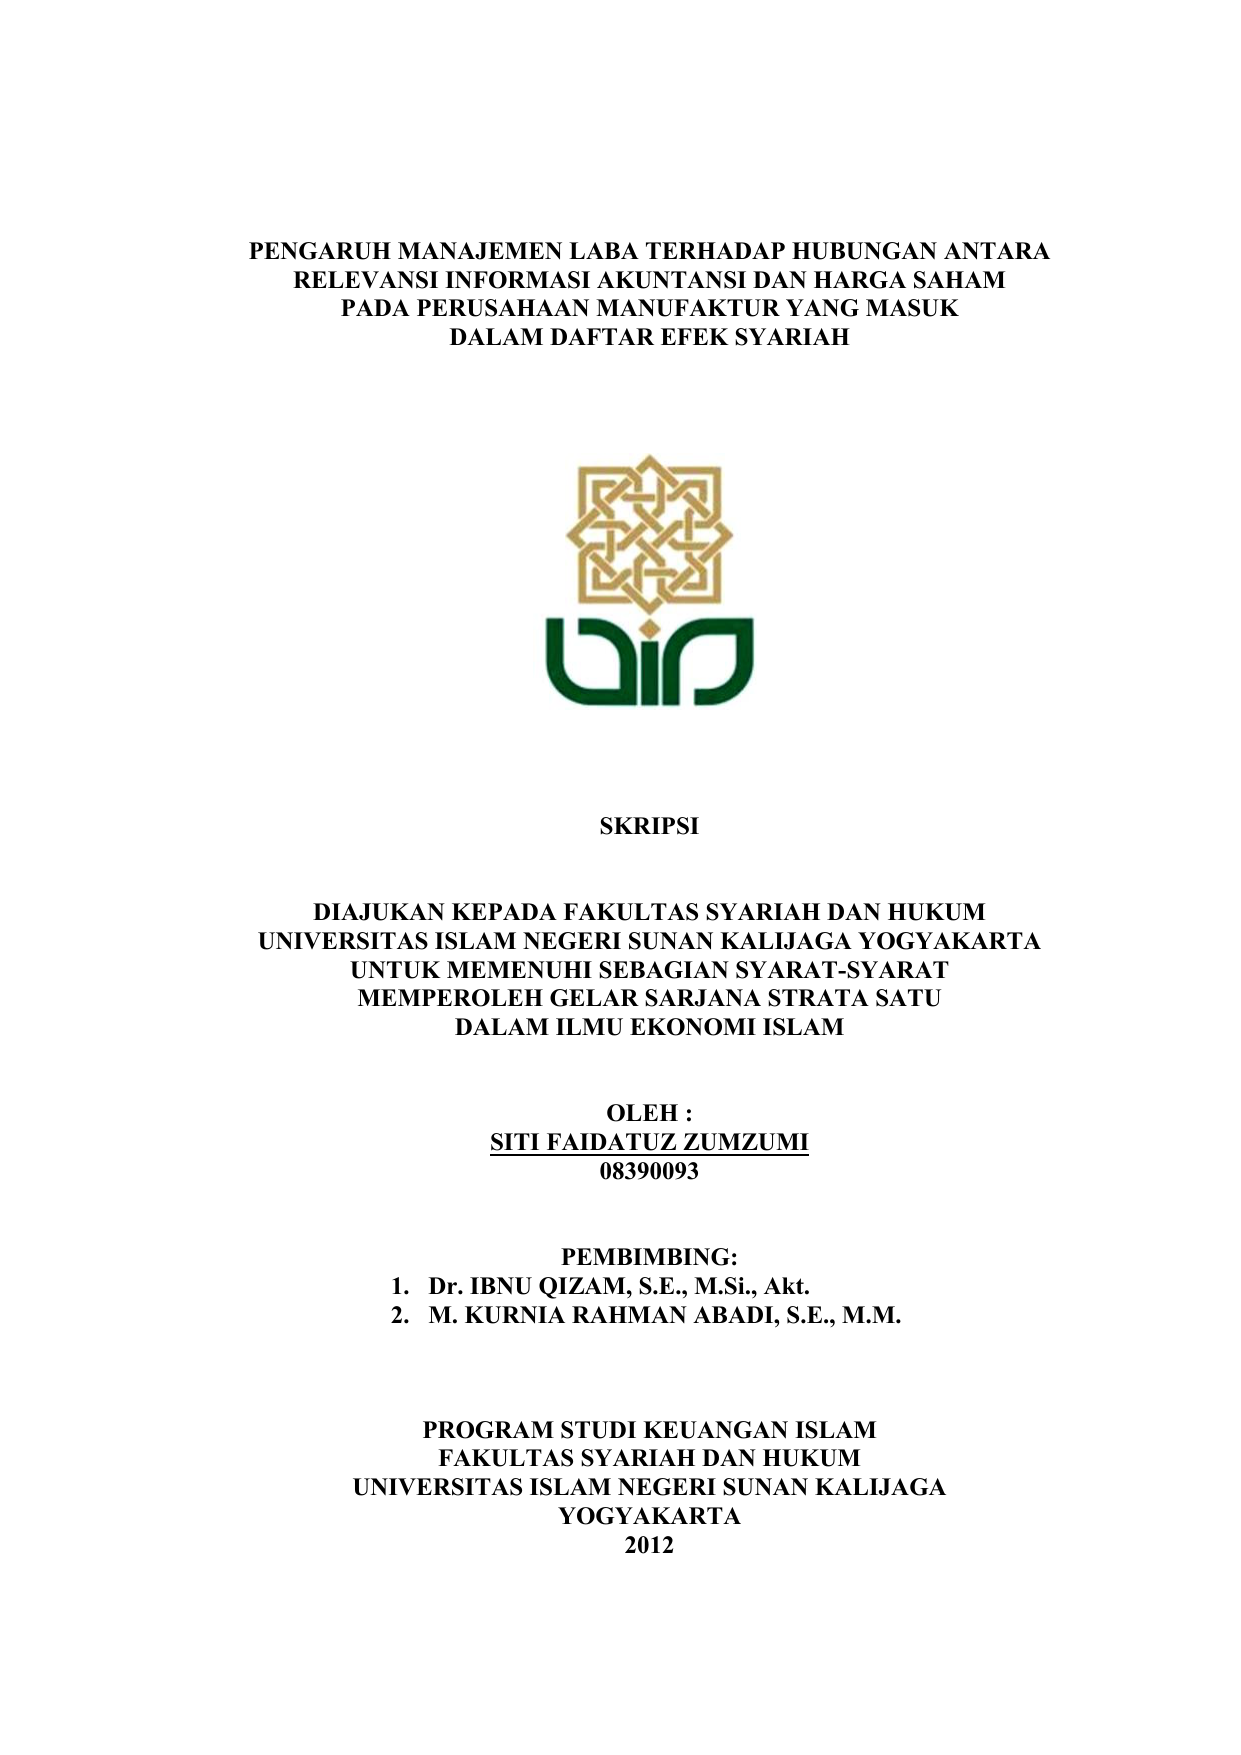 Bimbel Masuk Uin Sunan Kalijaga Yogyakarta Hukum Ekonomi Syariah